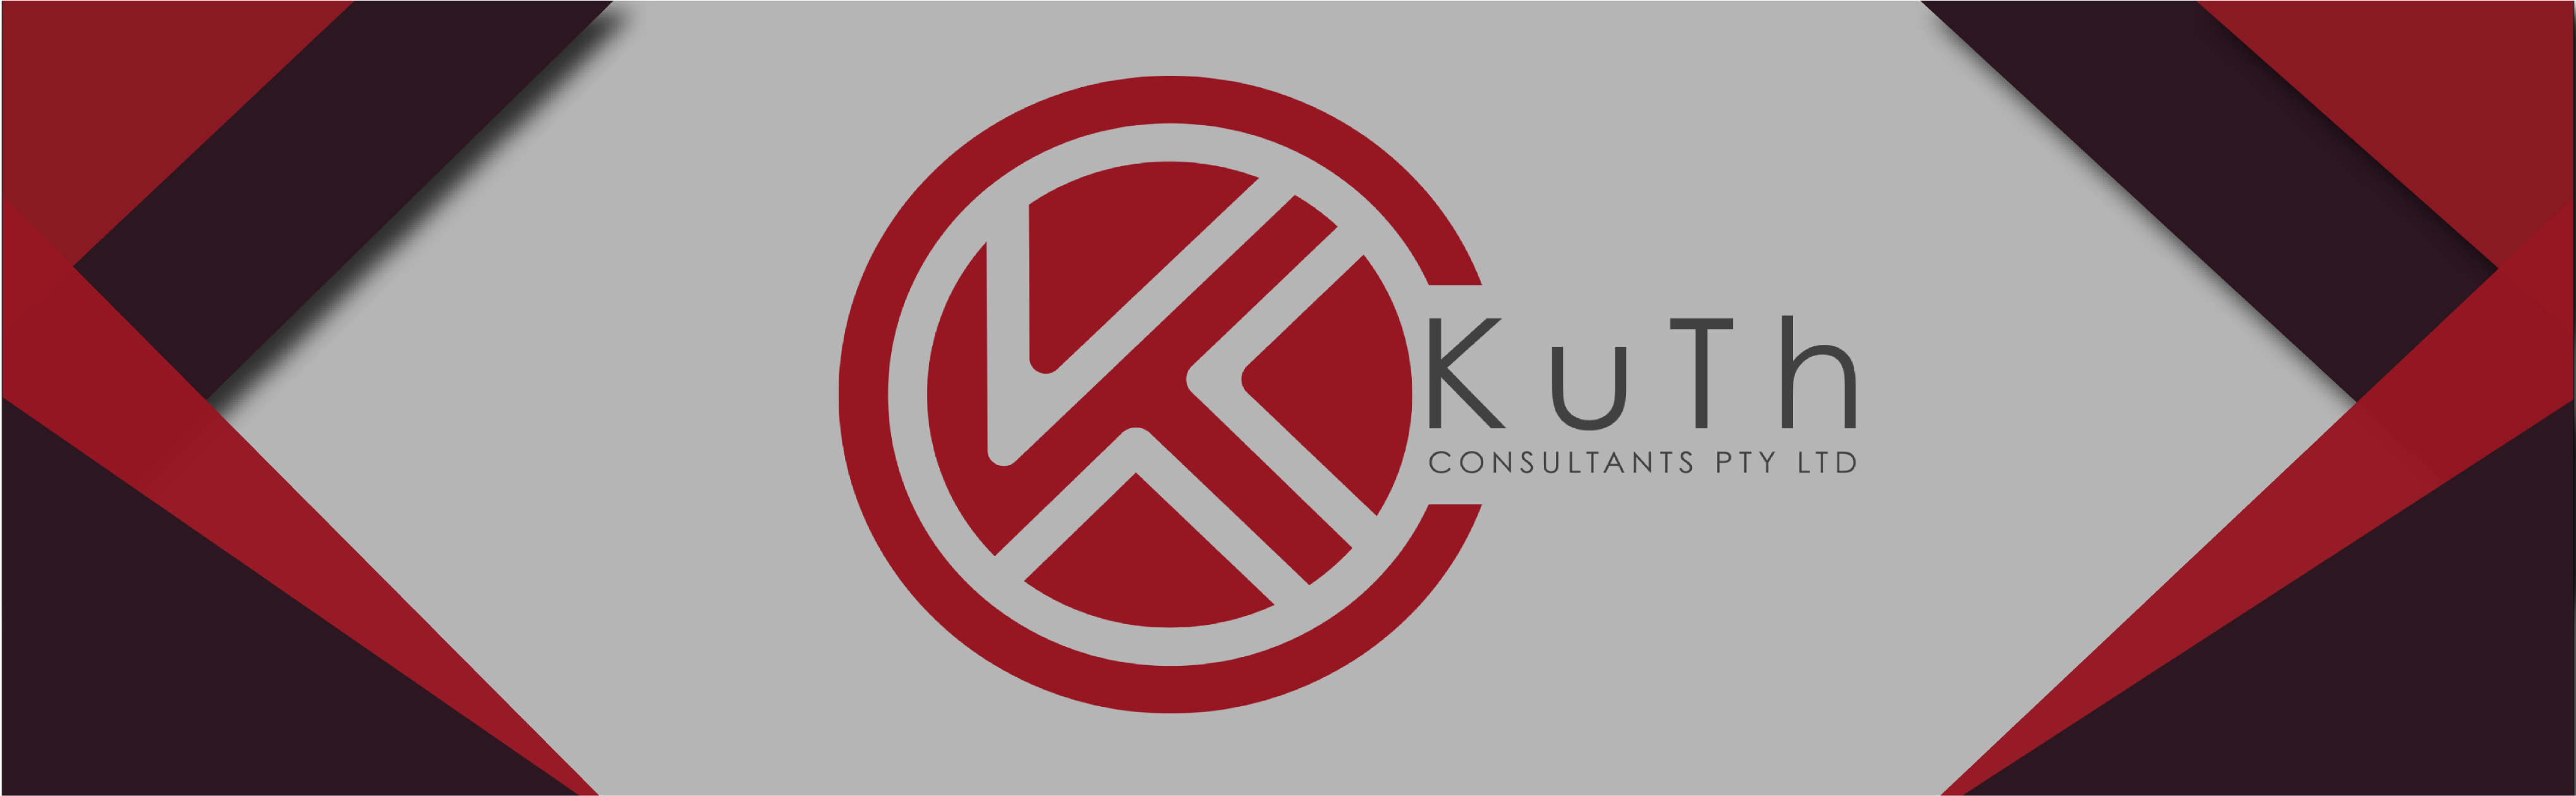 Kuth Consultants Logo